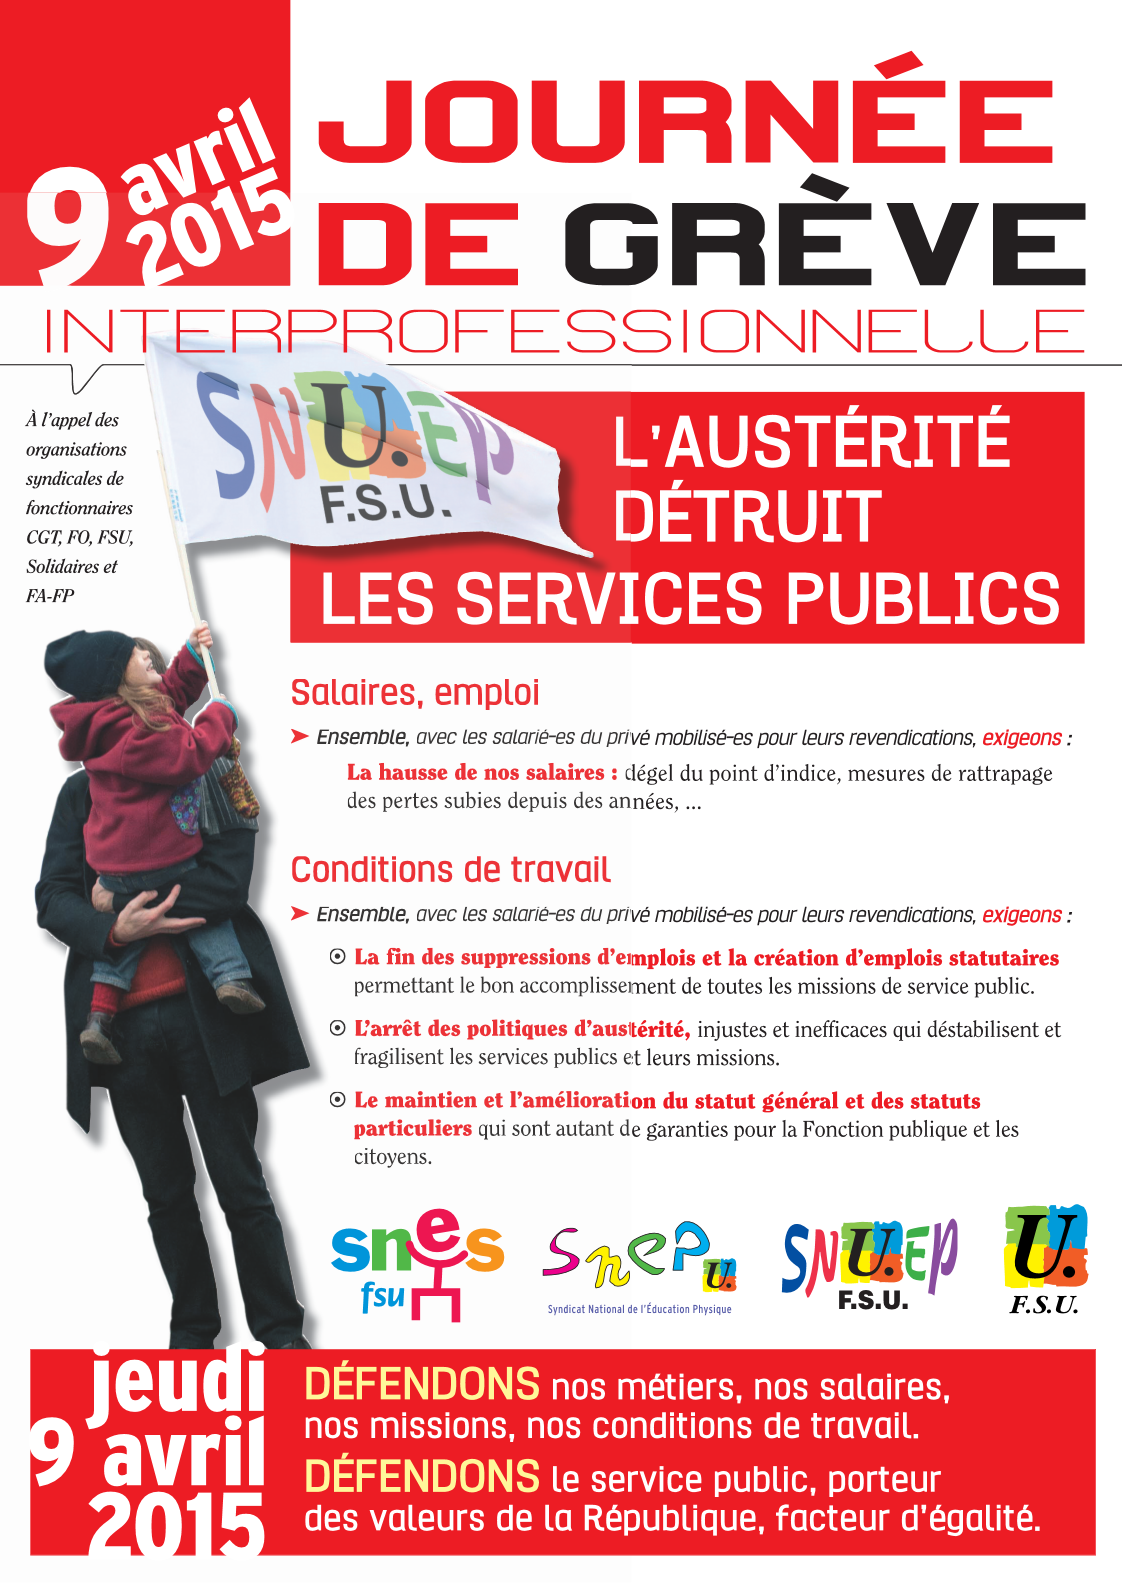 AFFICHE A3 GRV 09-04-2015 SNUEP PDF HD-1_Page_1